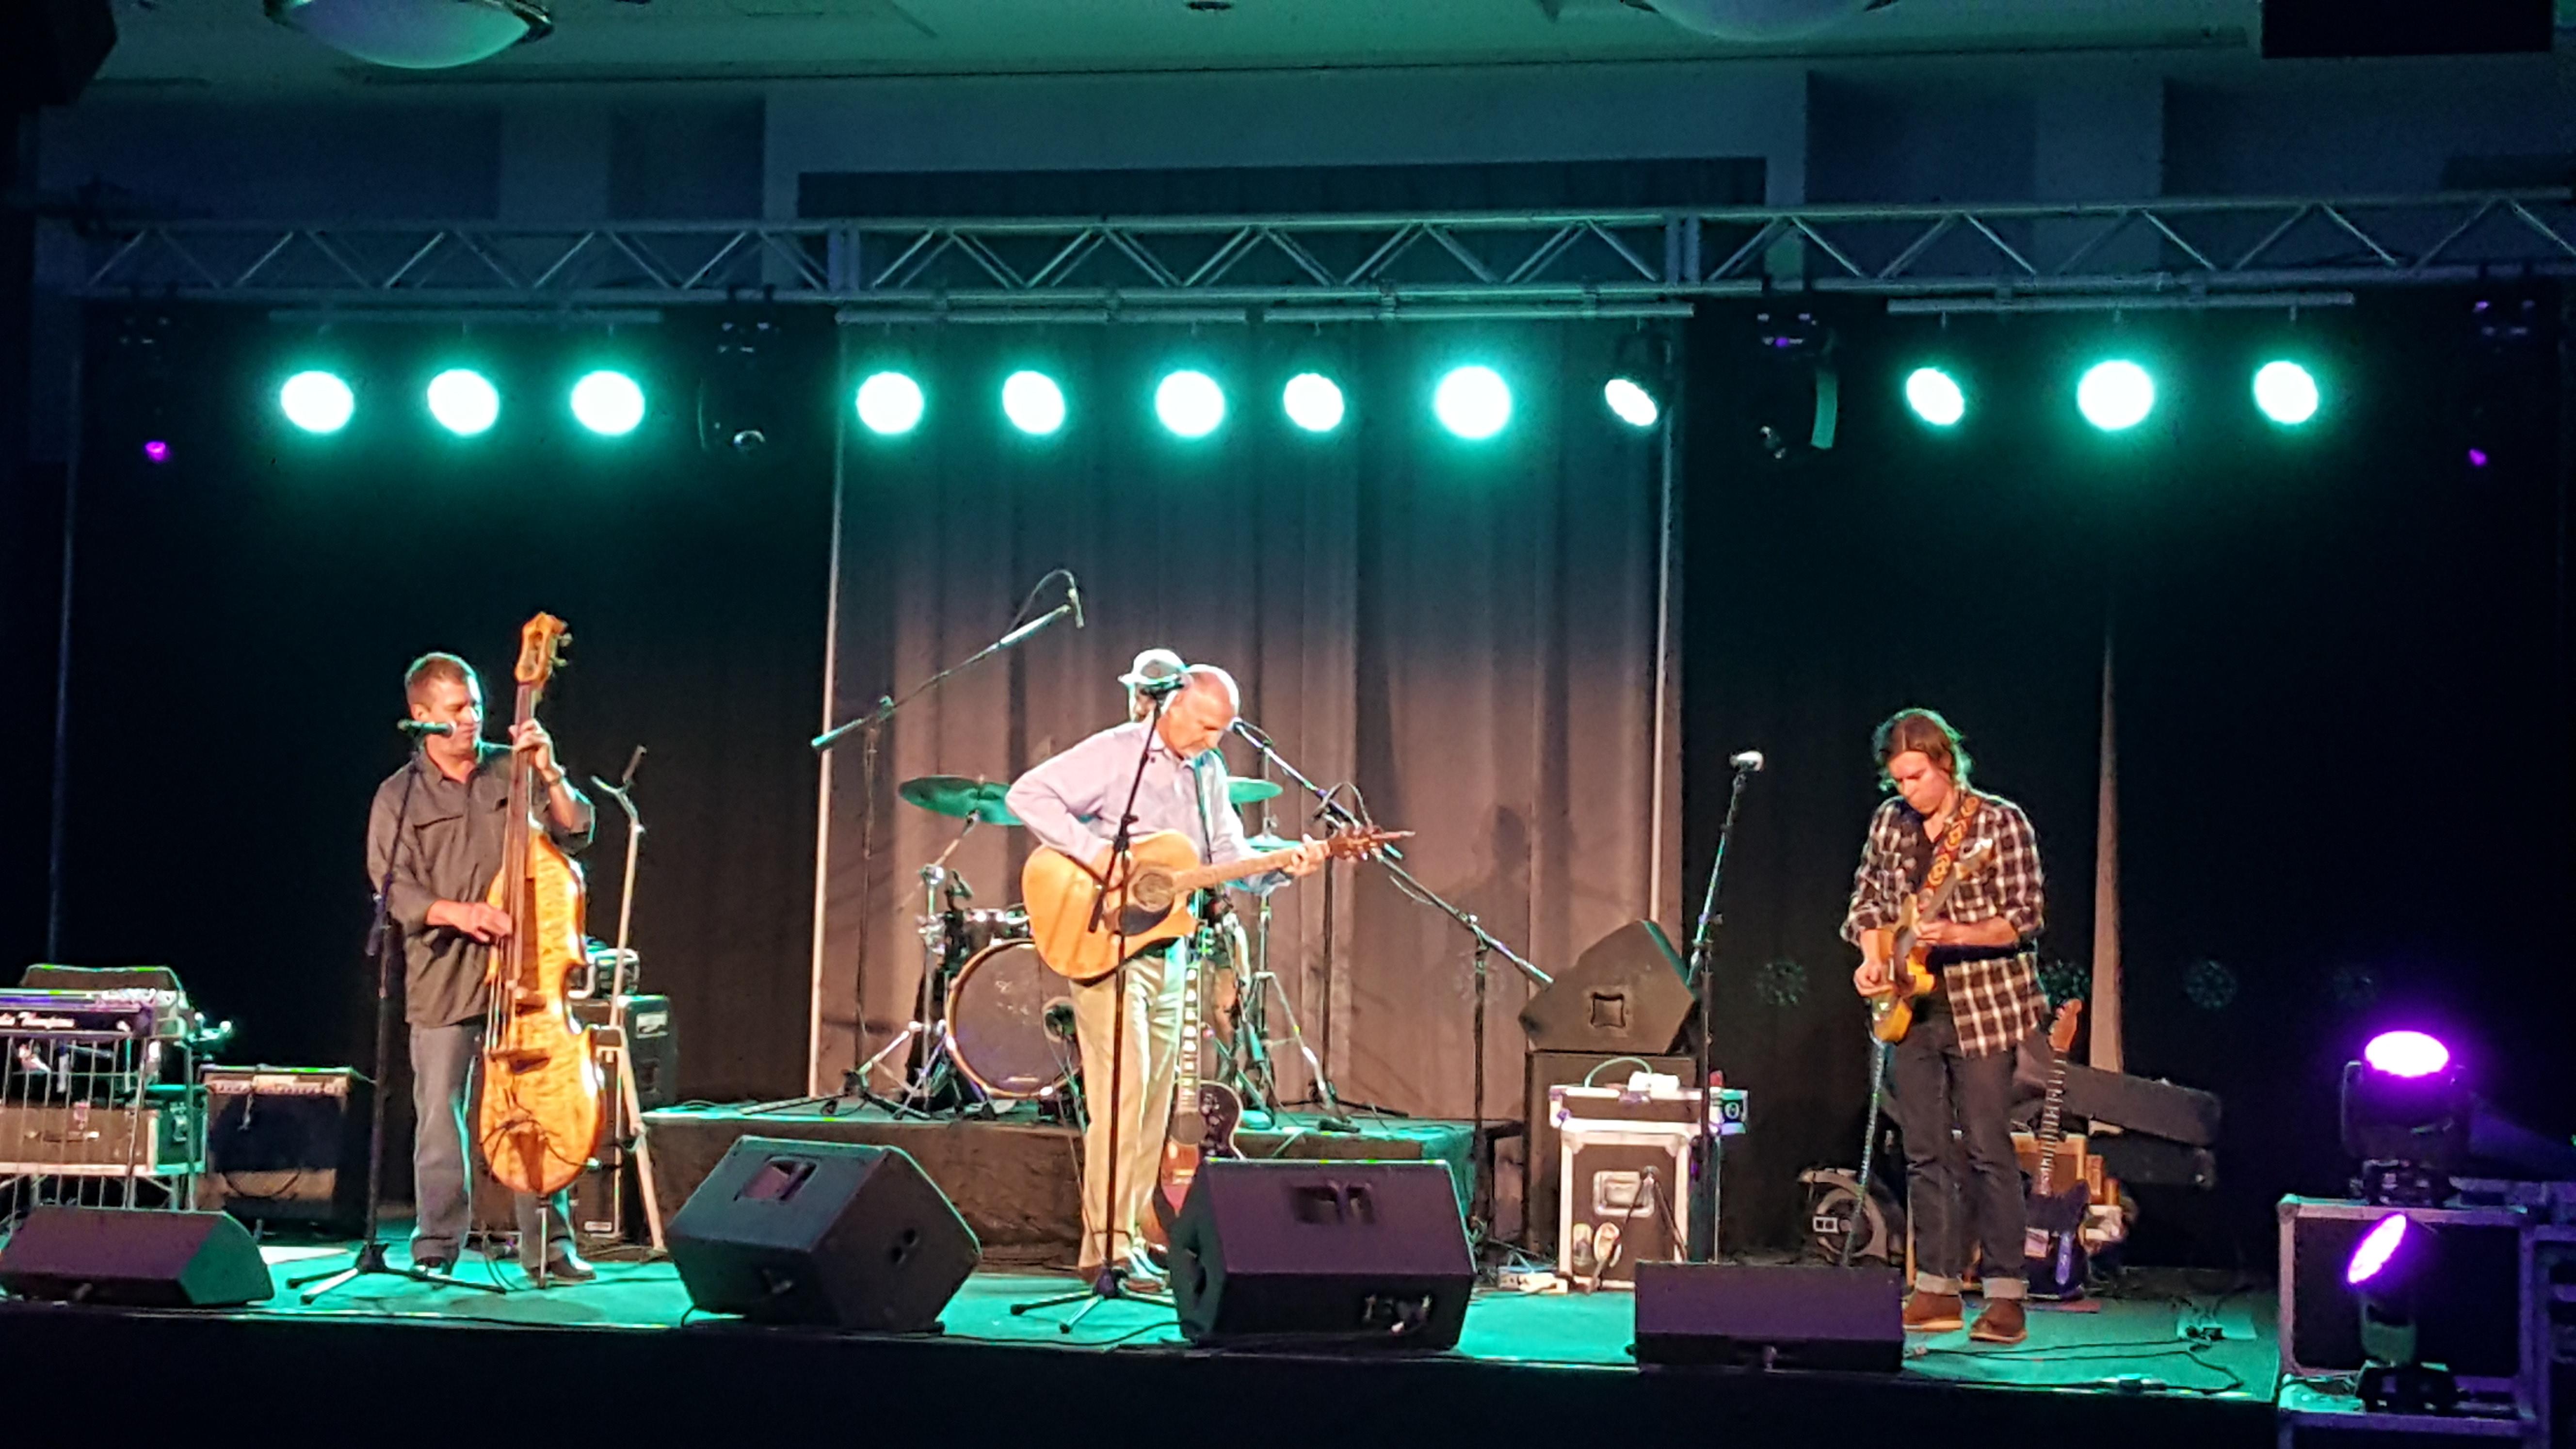 Concert in Grand Ballroom